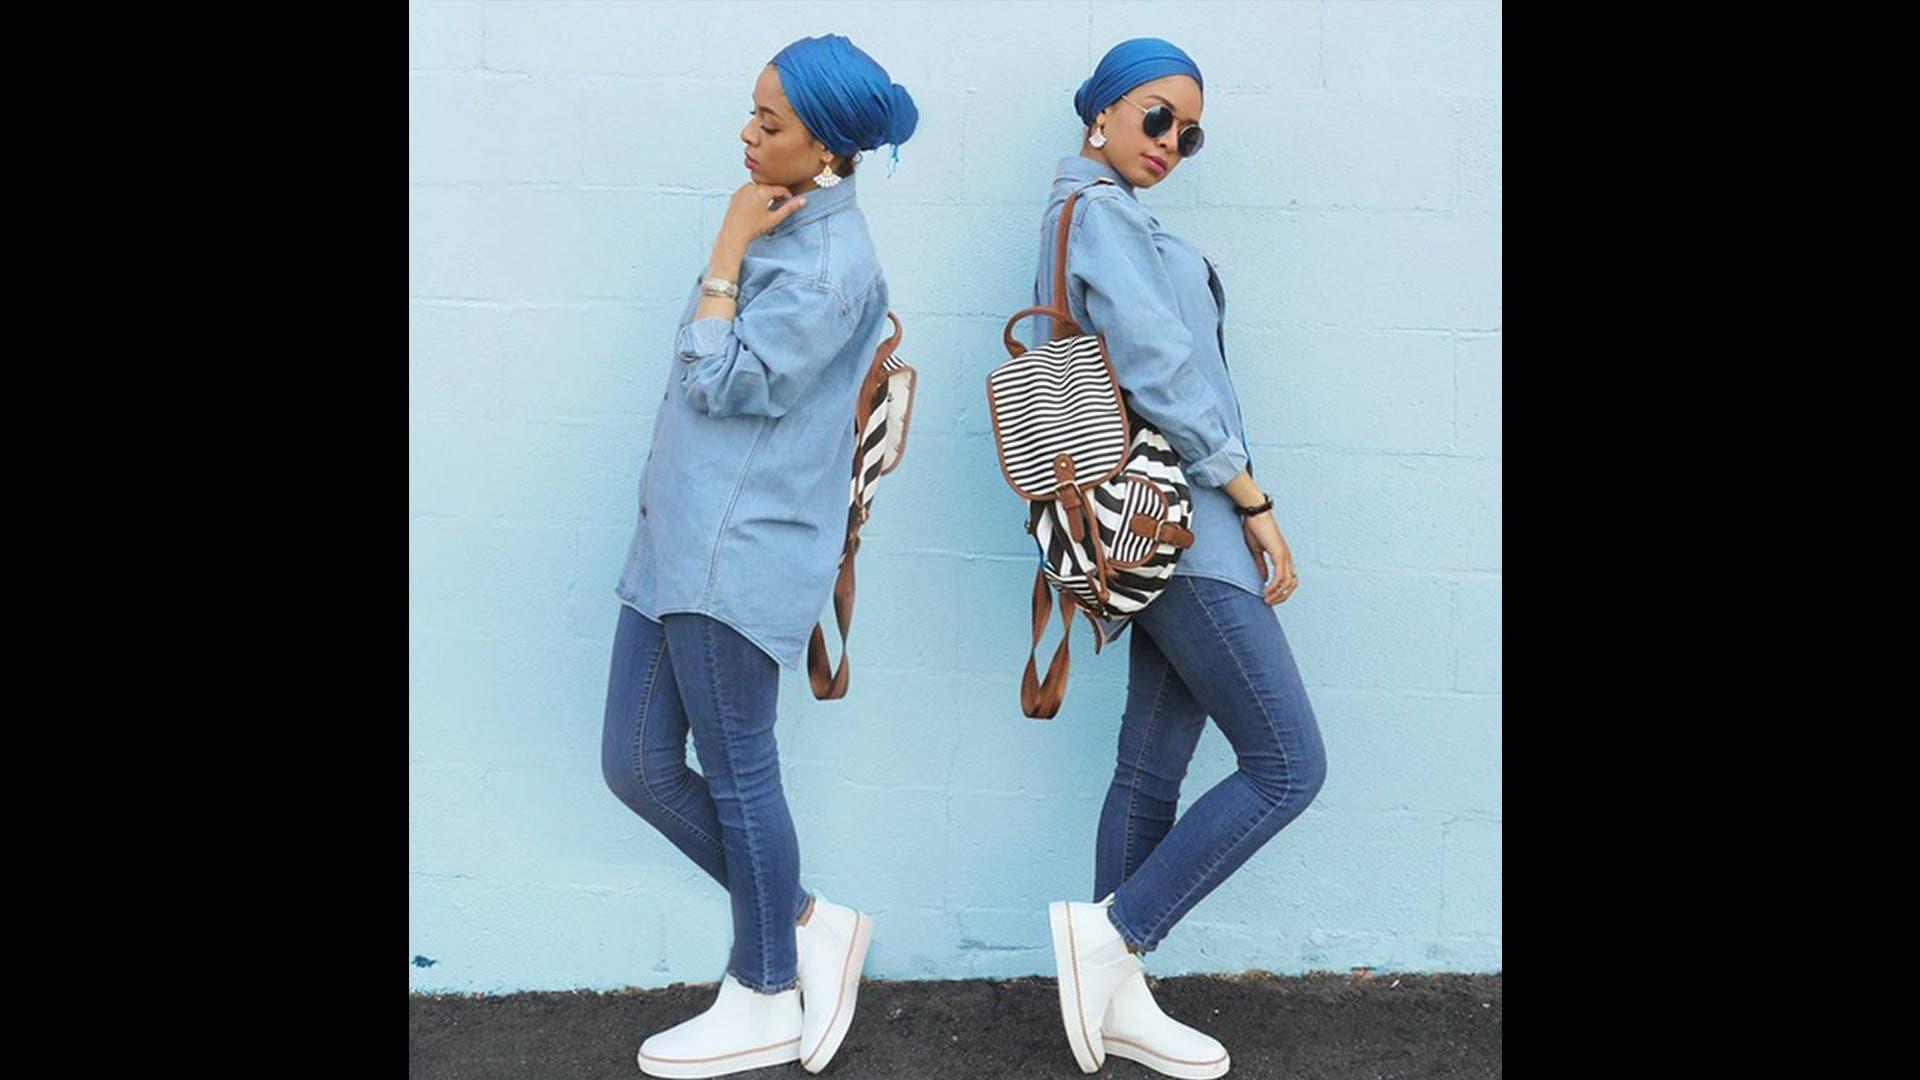 Hijabi street style These 14 fashionistas put the urban in